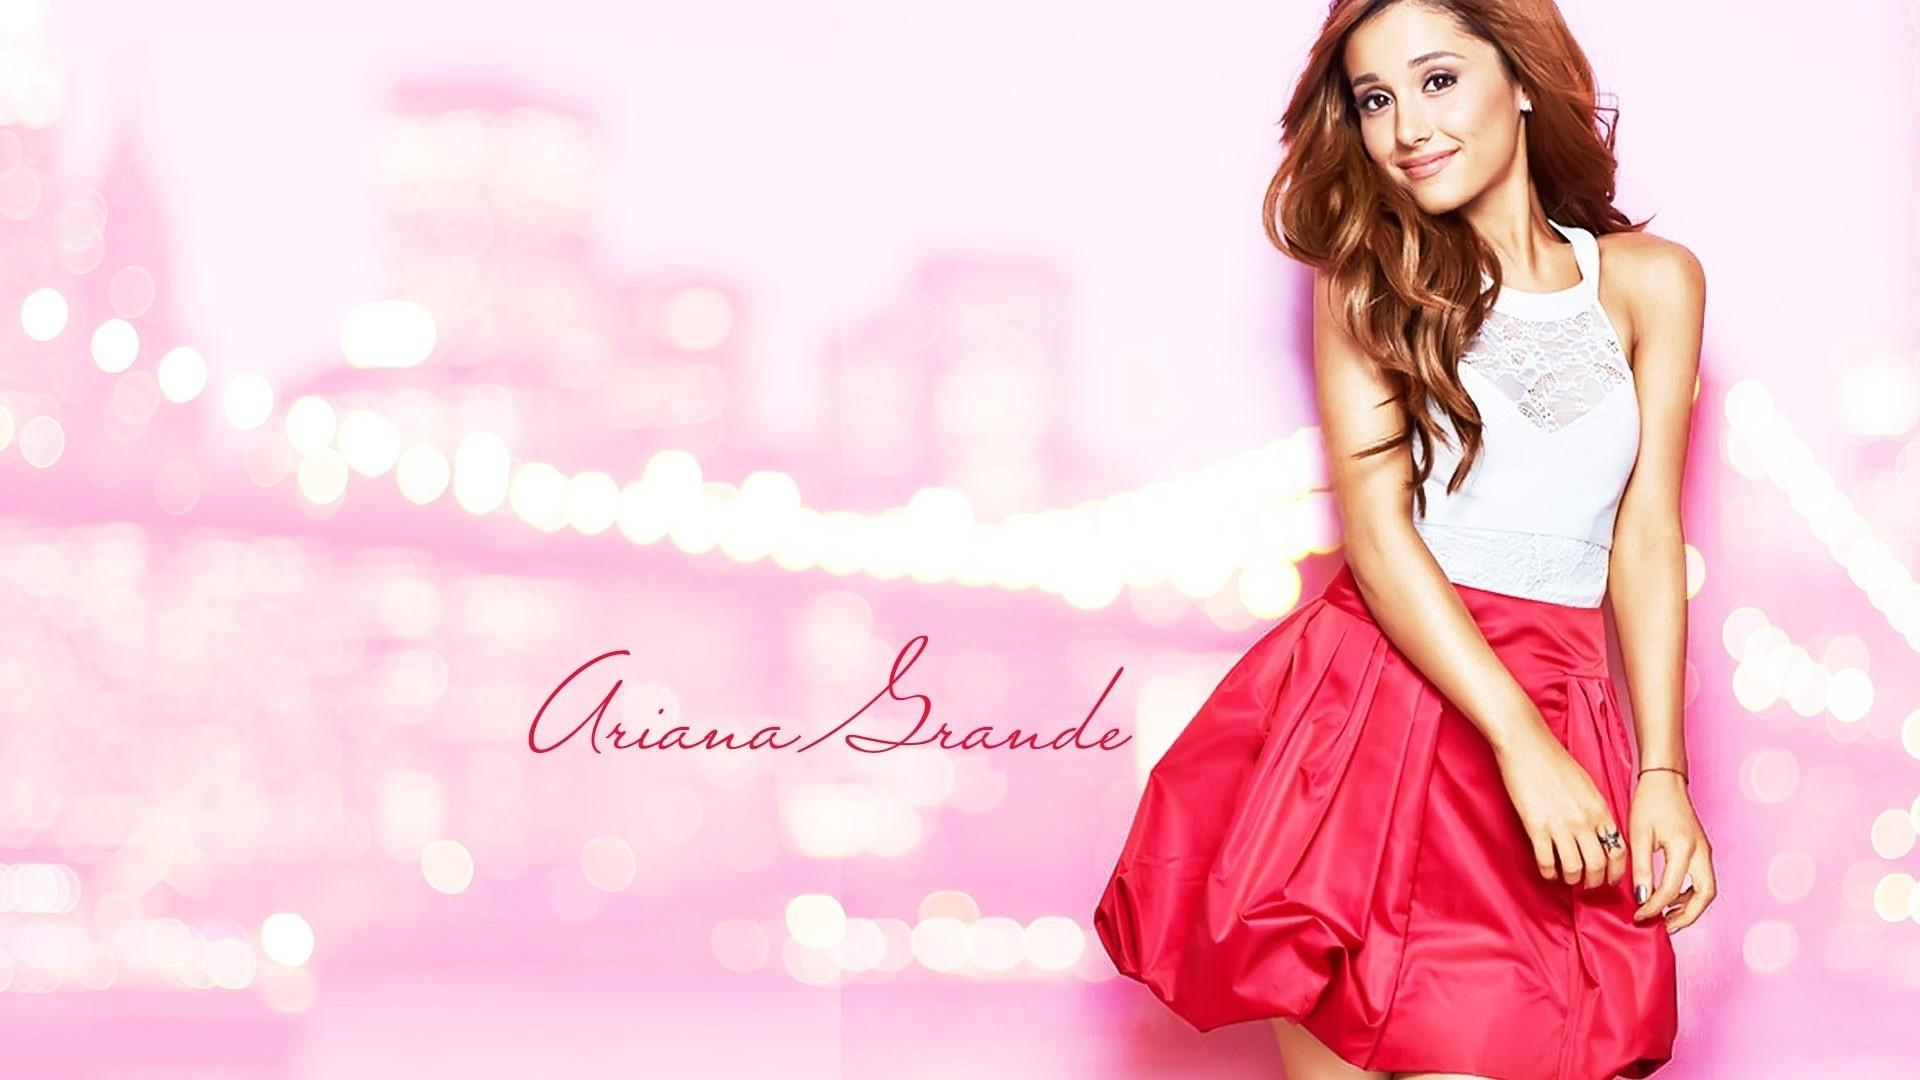 Ariana Grande Aesthetic Background